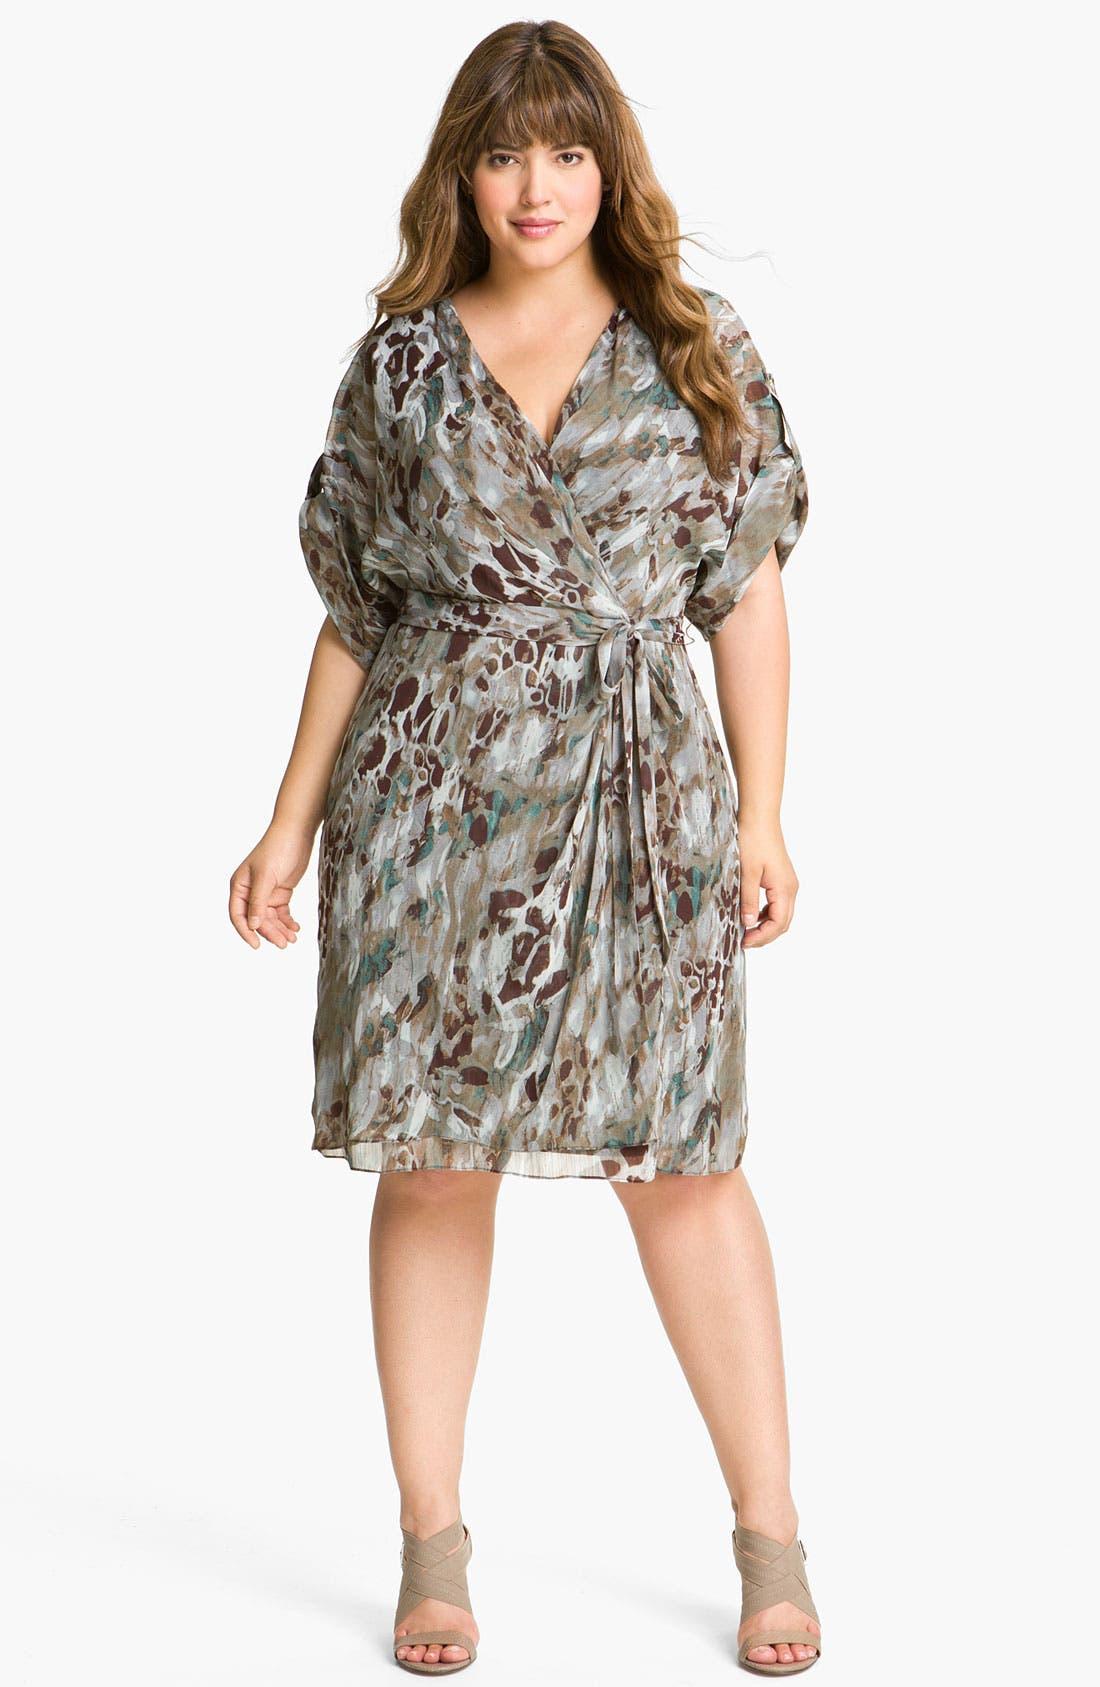 Alternate Image 1 Selected - Adrianna Papell Print Faux Wrap Chiffon Dress (Plus)